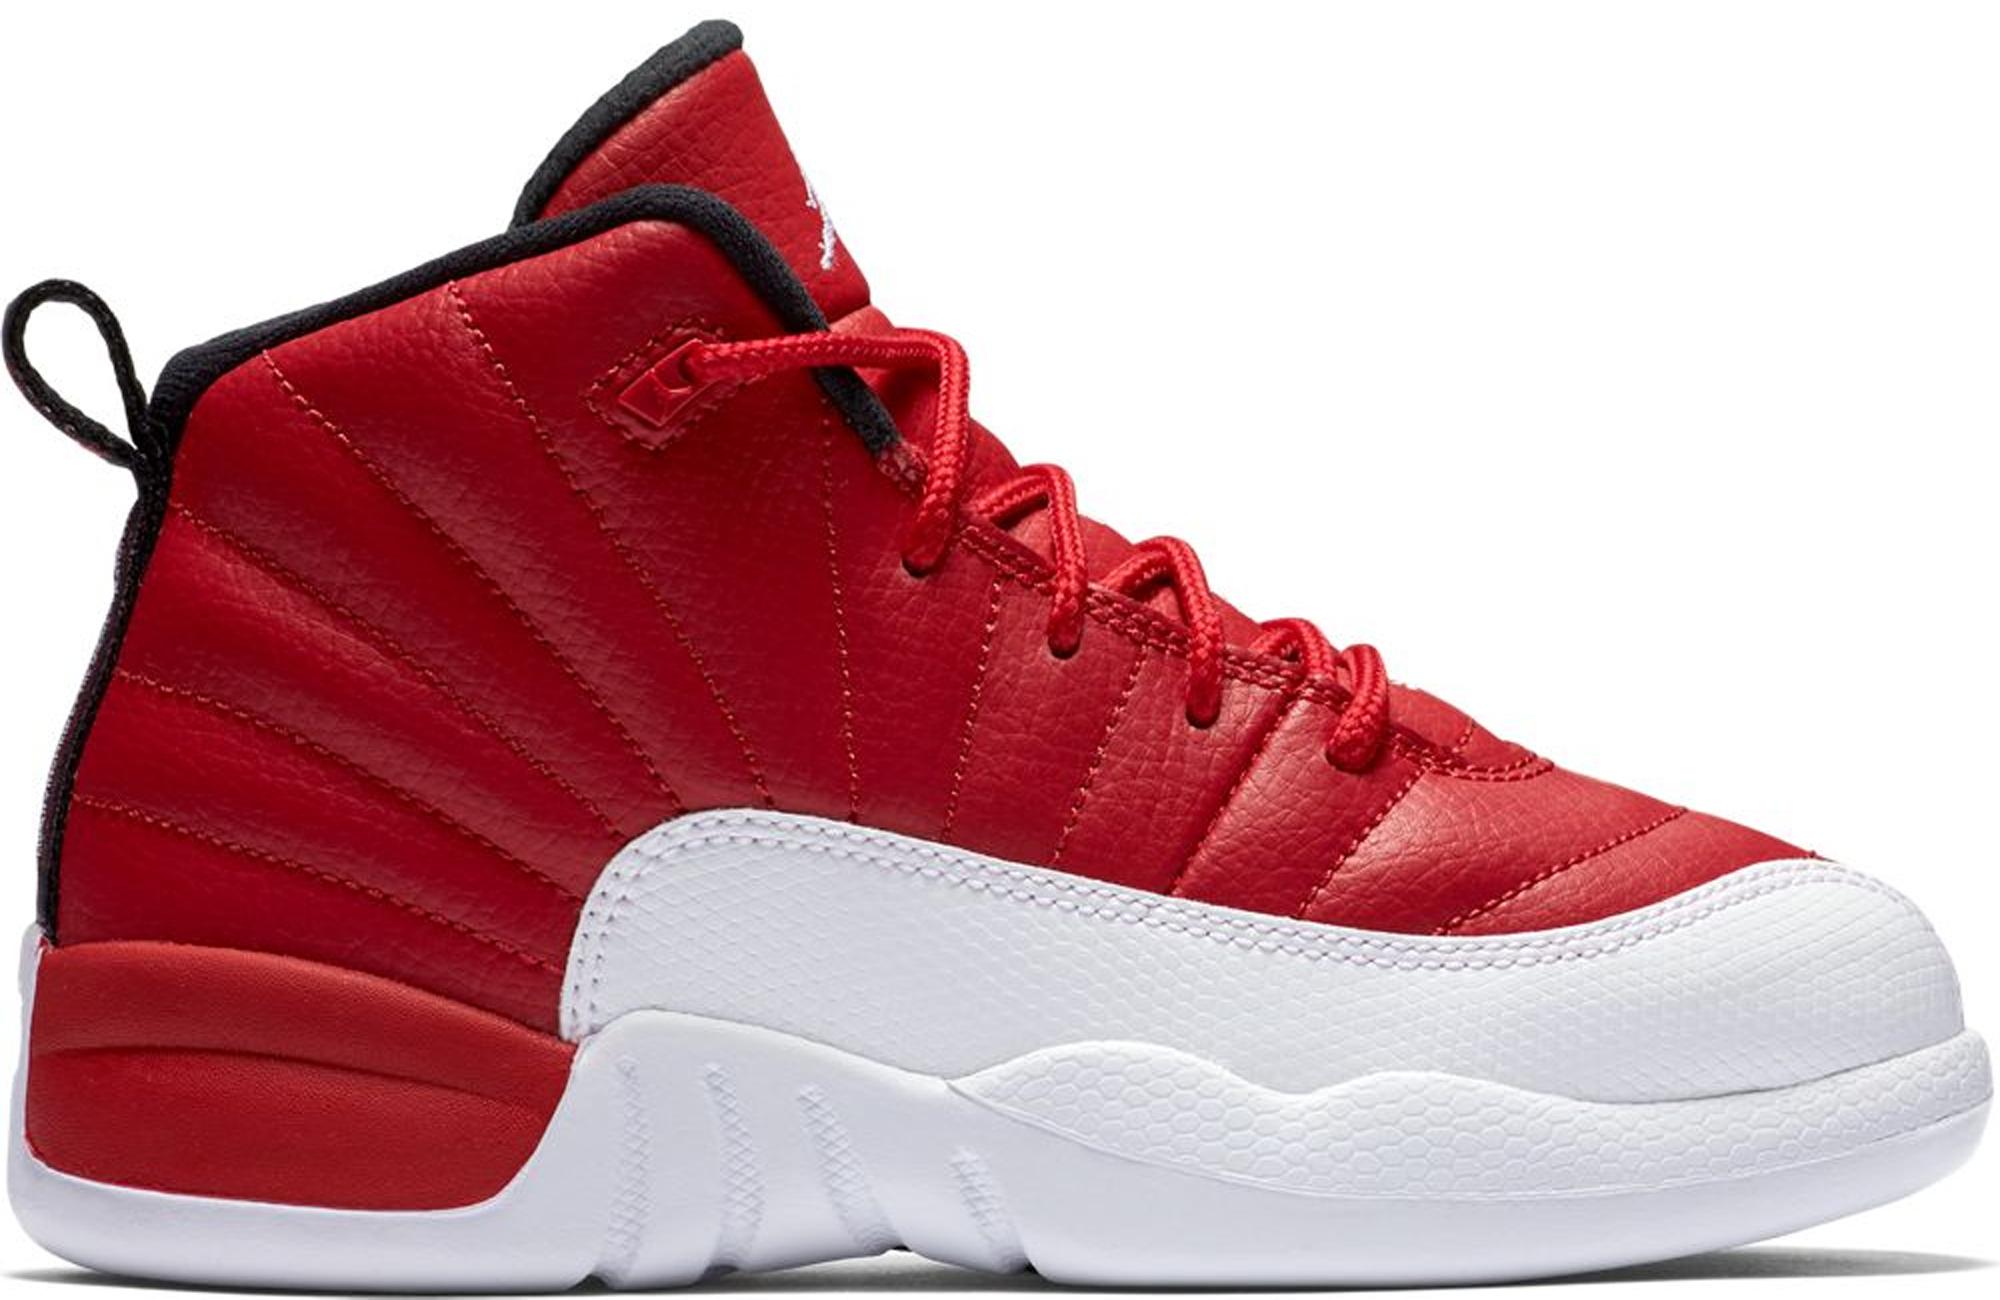 Jordan 12 Retro Alternate (PS) - 151186-600